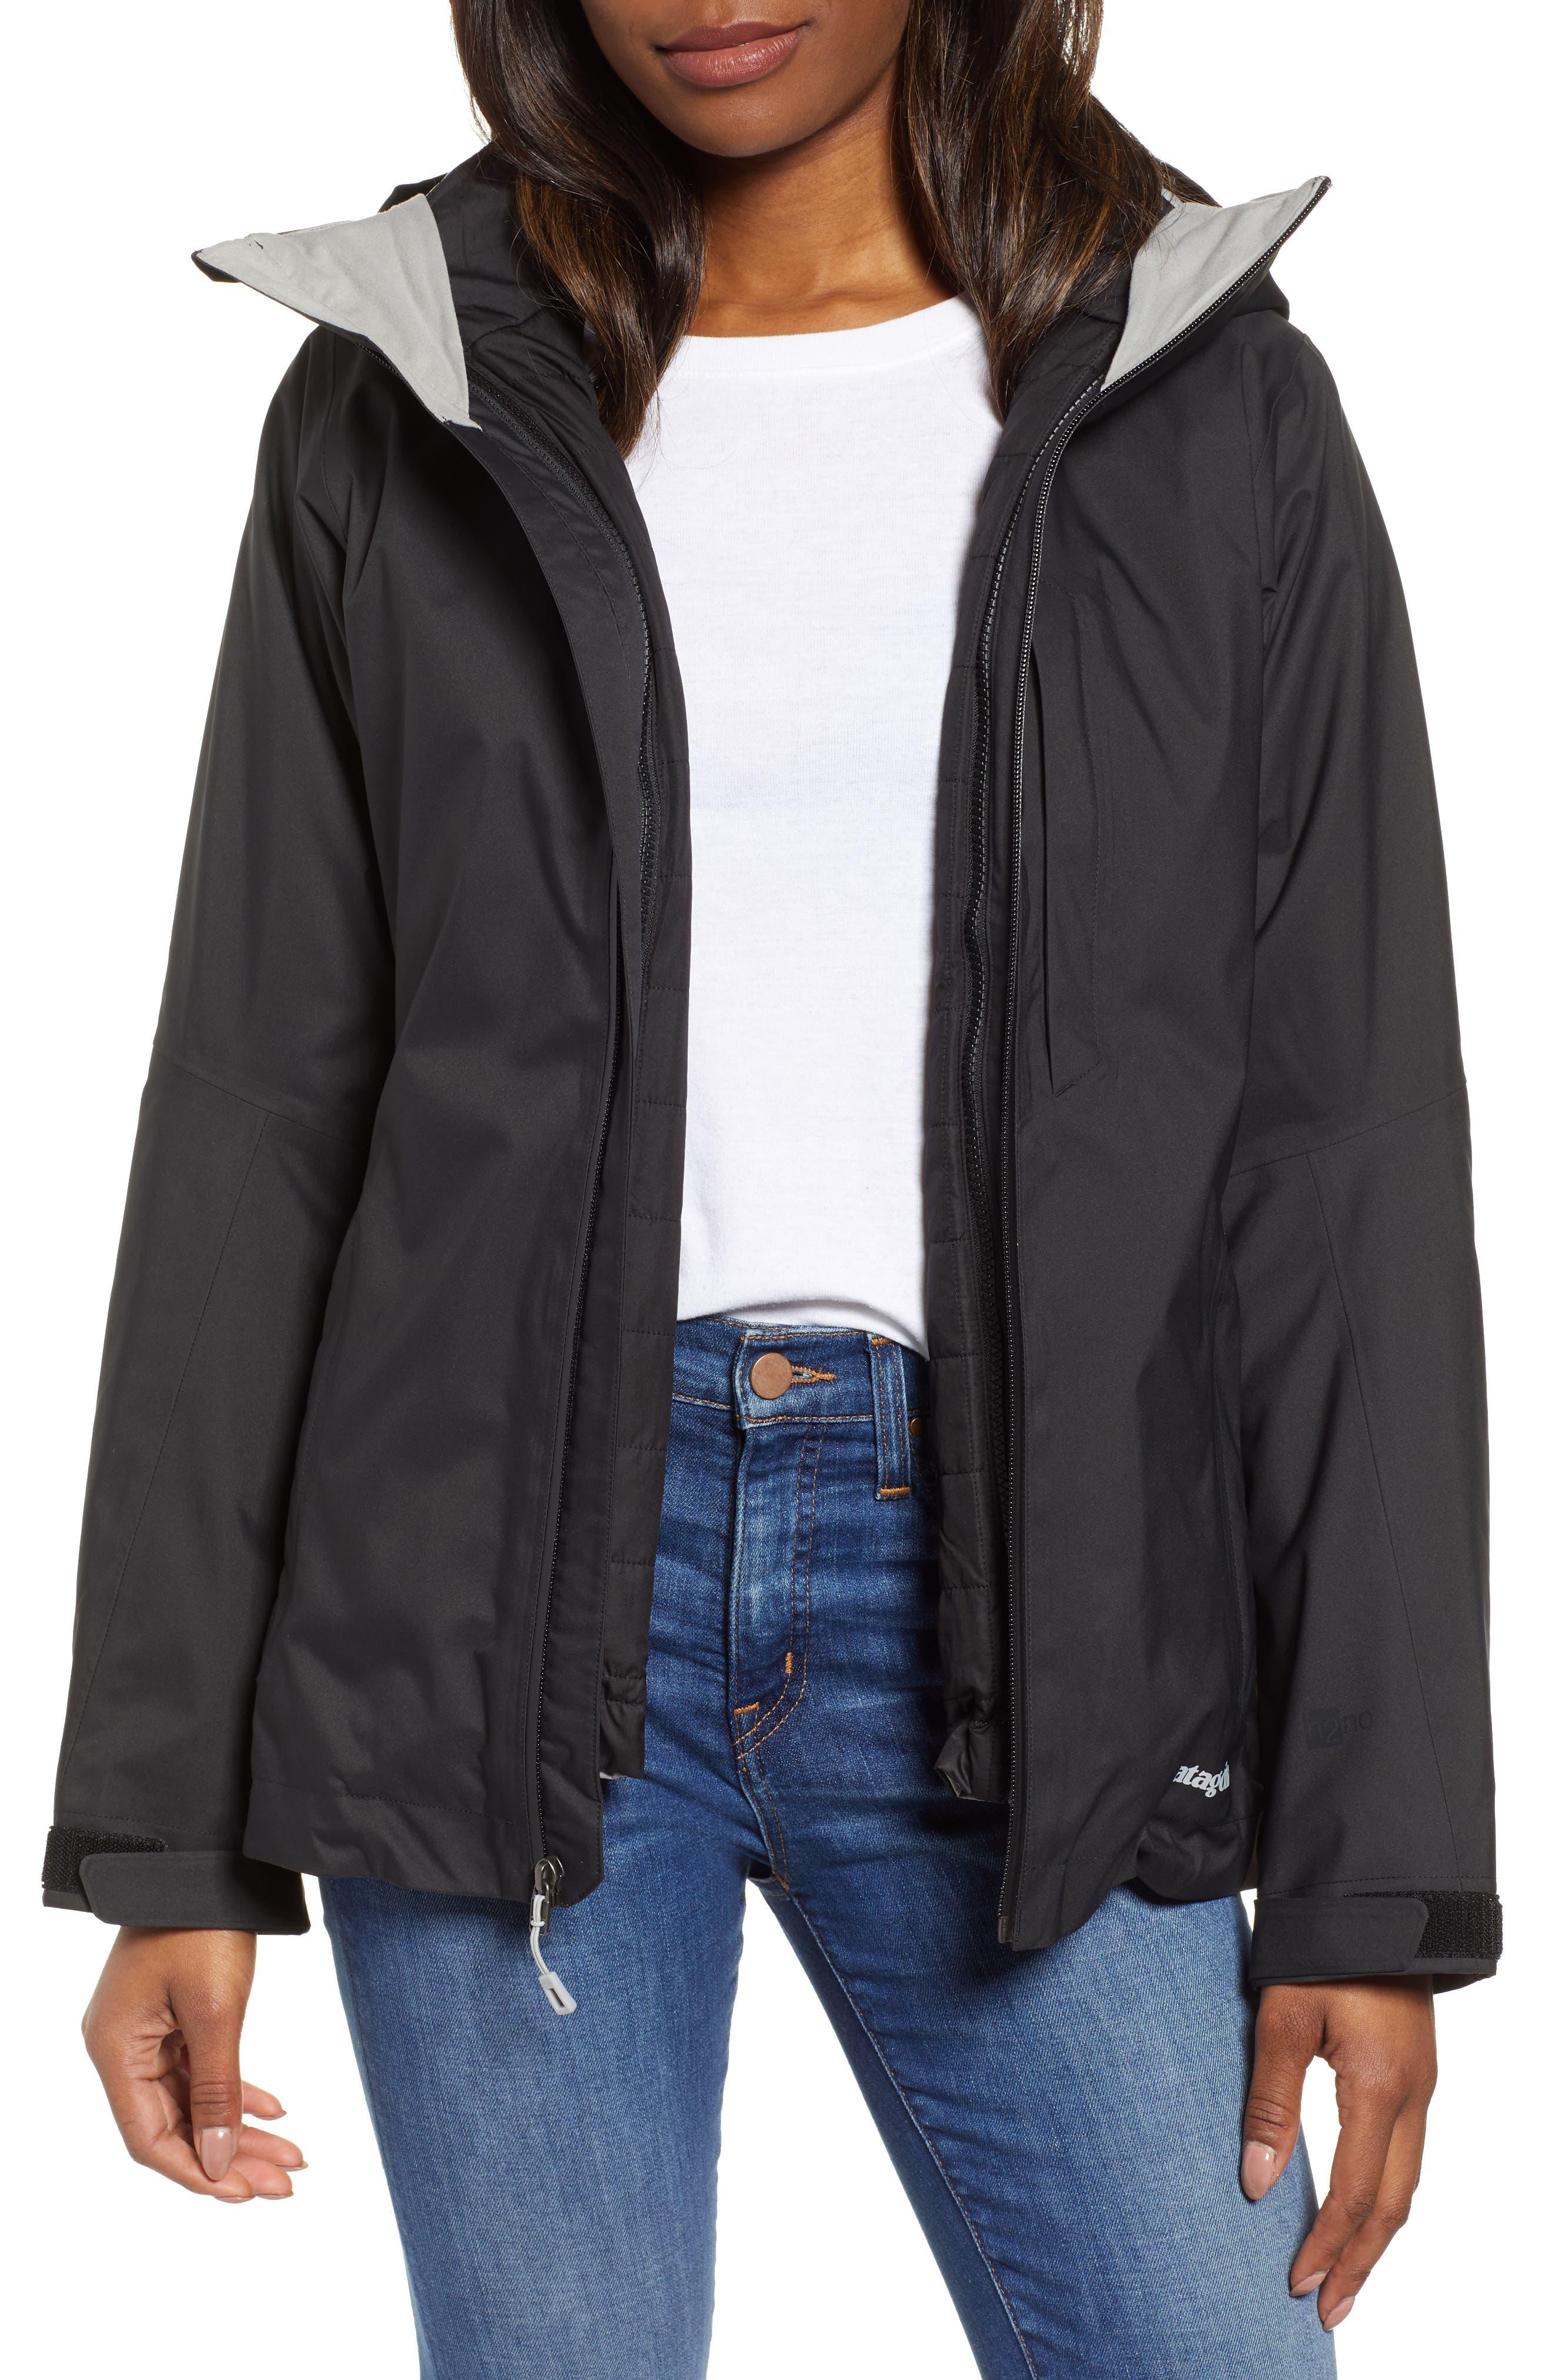 Snowbelle 3-in-1 Jacket,                         Main,                         color, BLACK